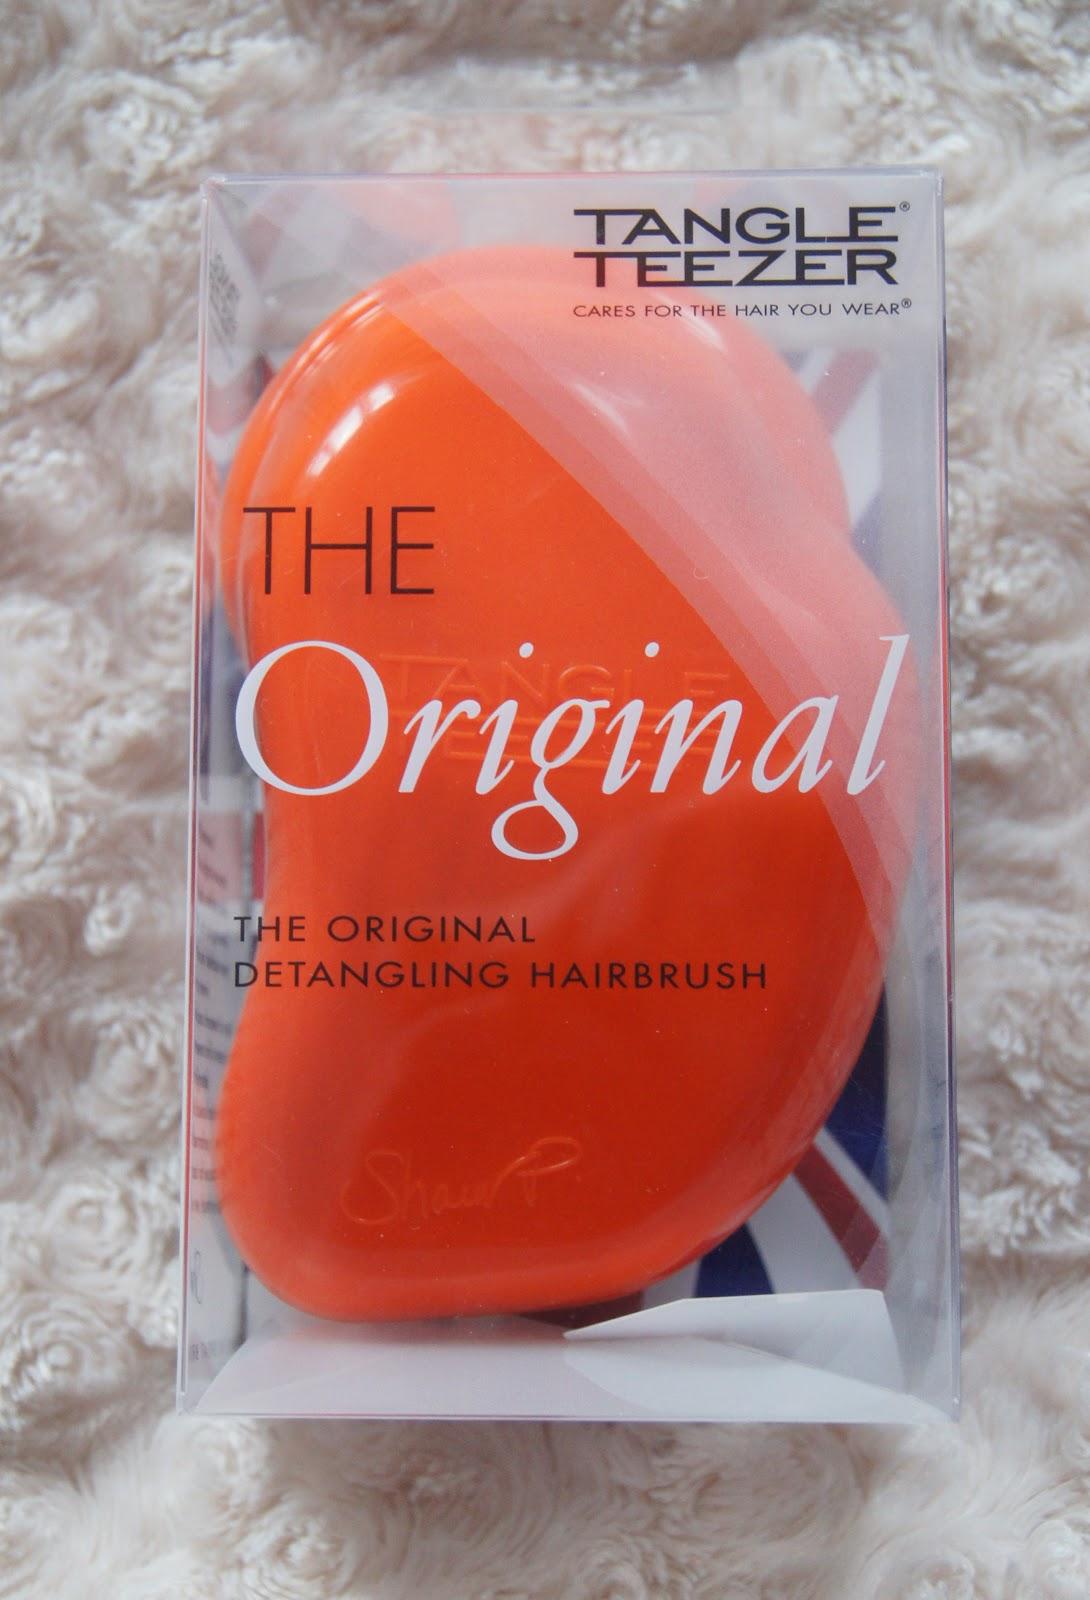 tangle teezer original detangling hairbrush review